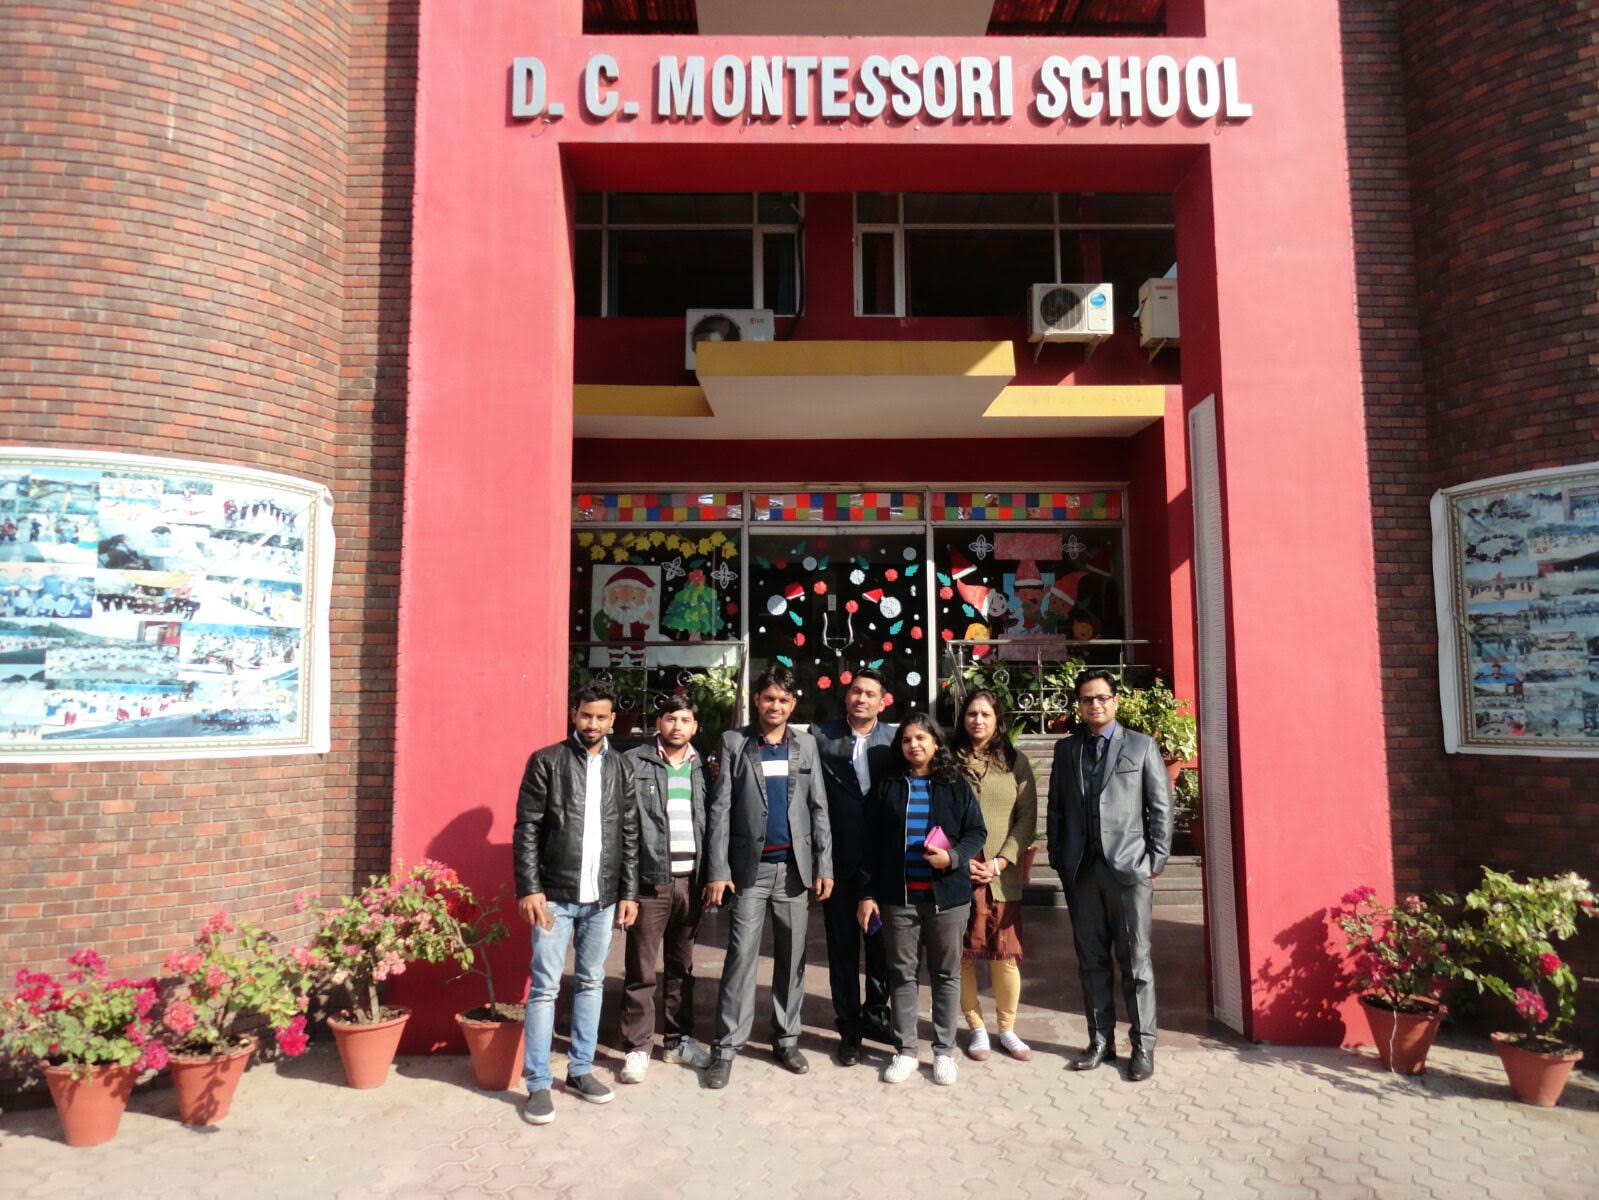 DC Montessori Senior Secondary School